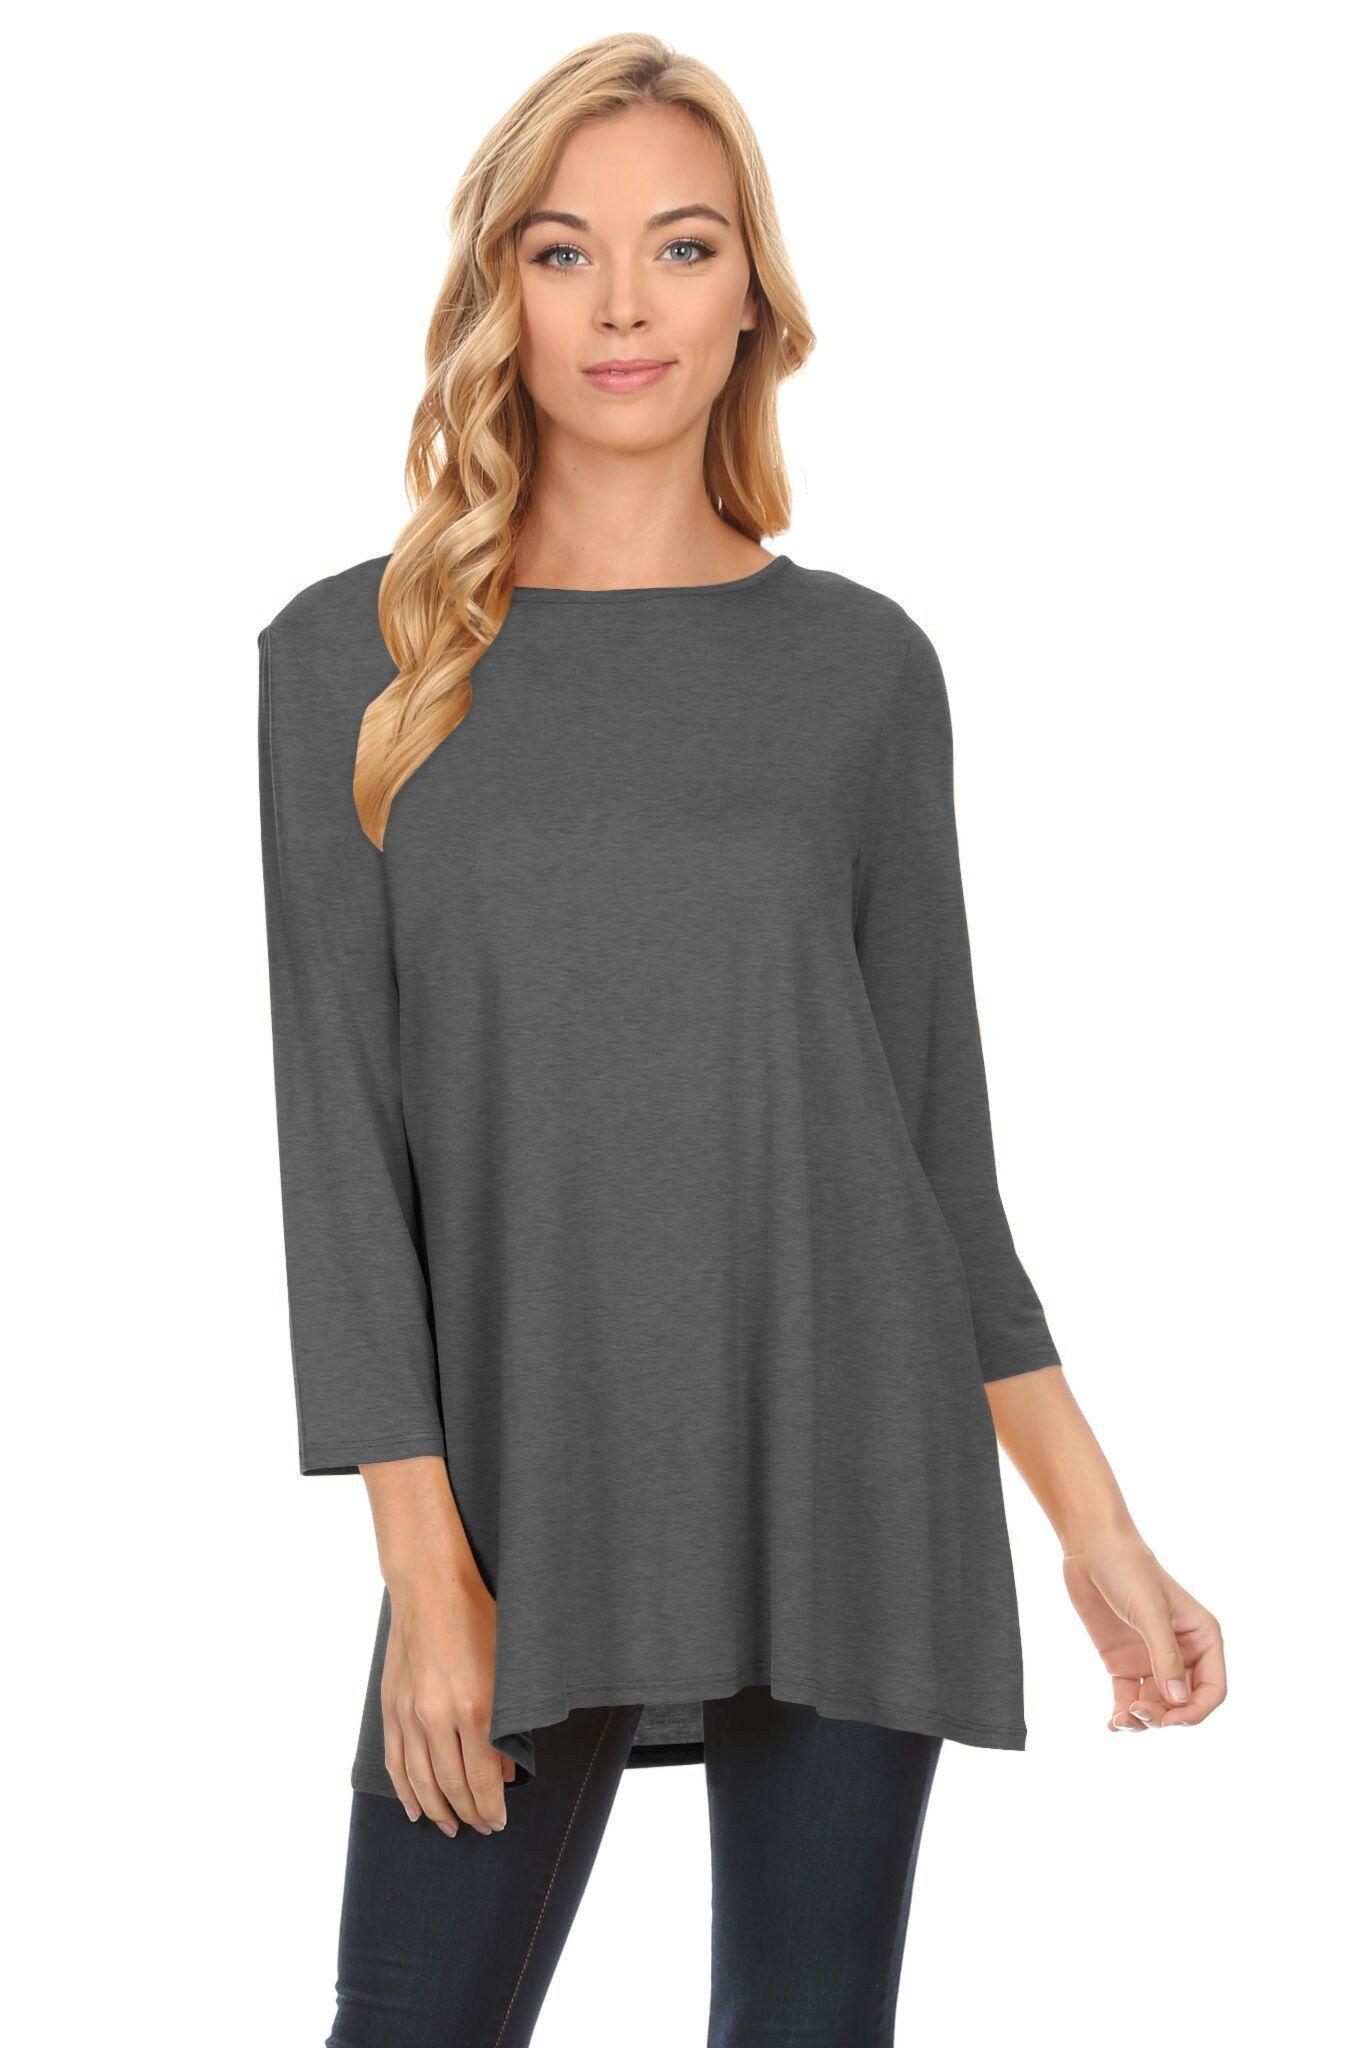 f50973e448f Beautifully basic tunic | Products | Tunic tops for leggings, Tunic ...